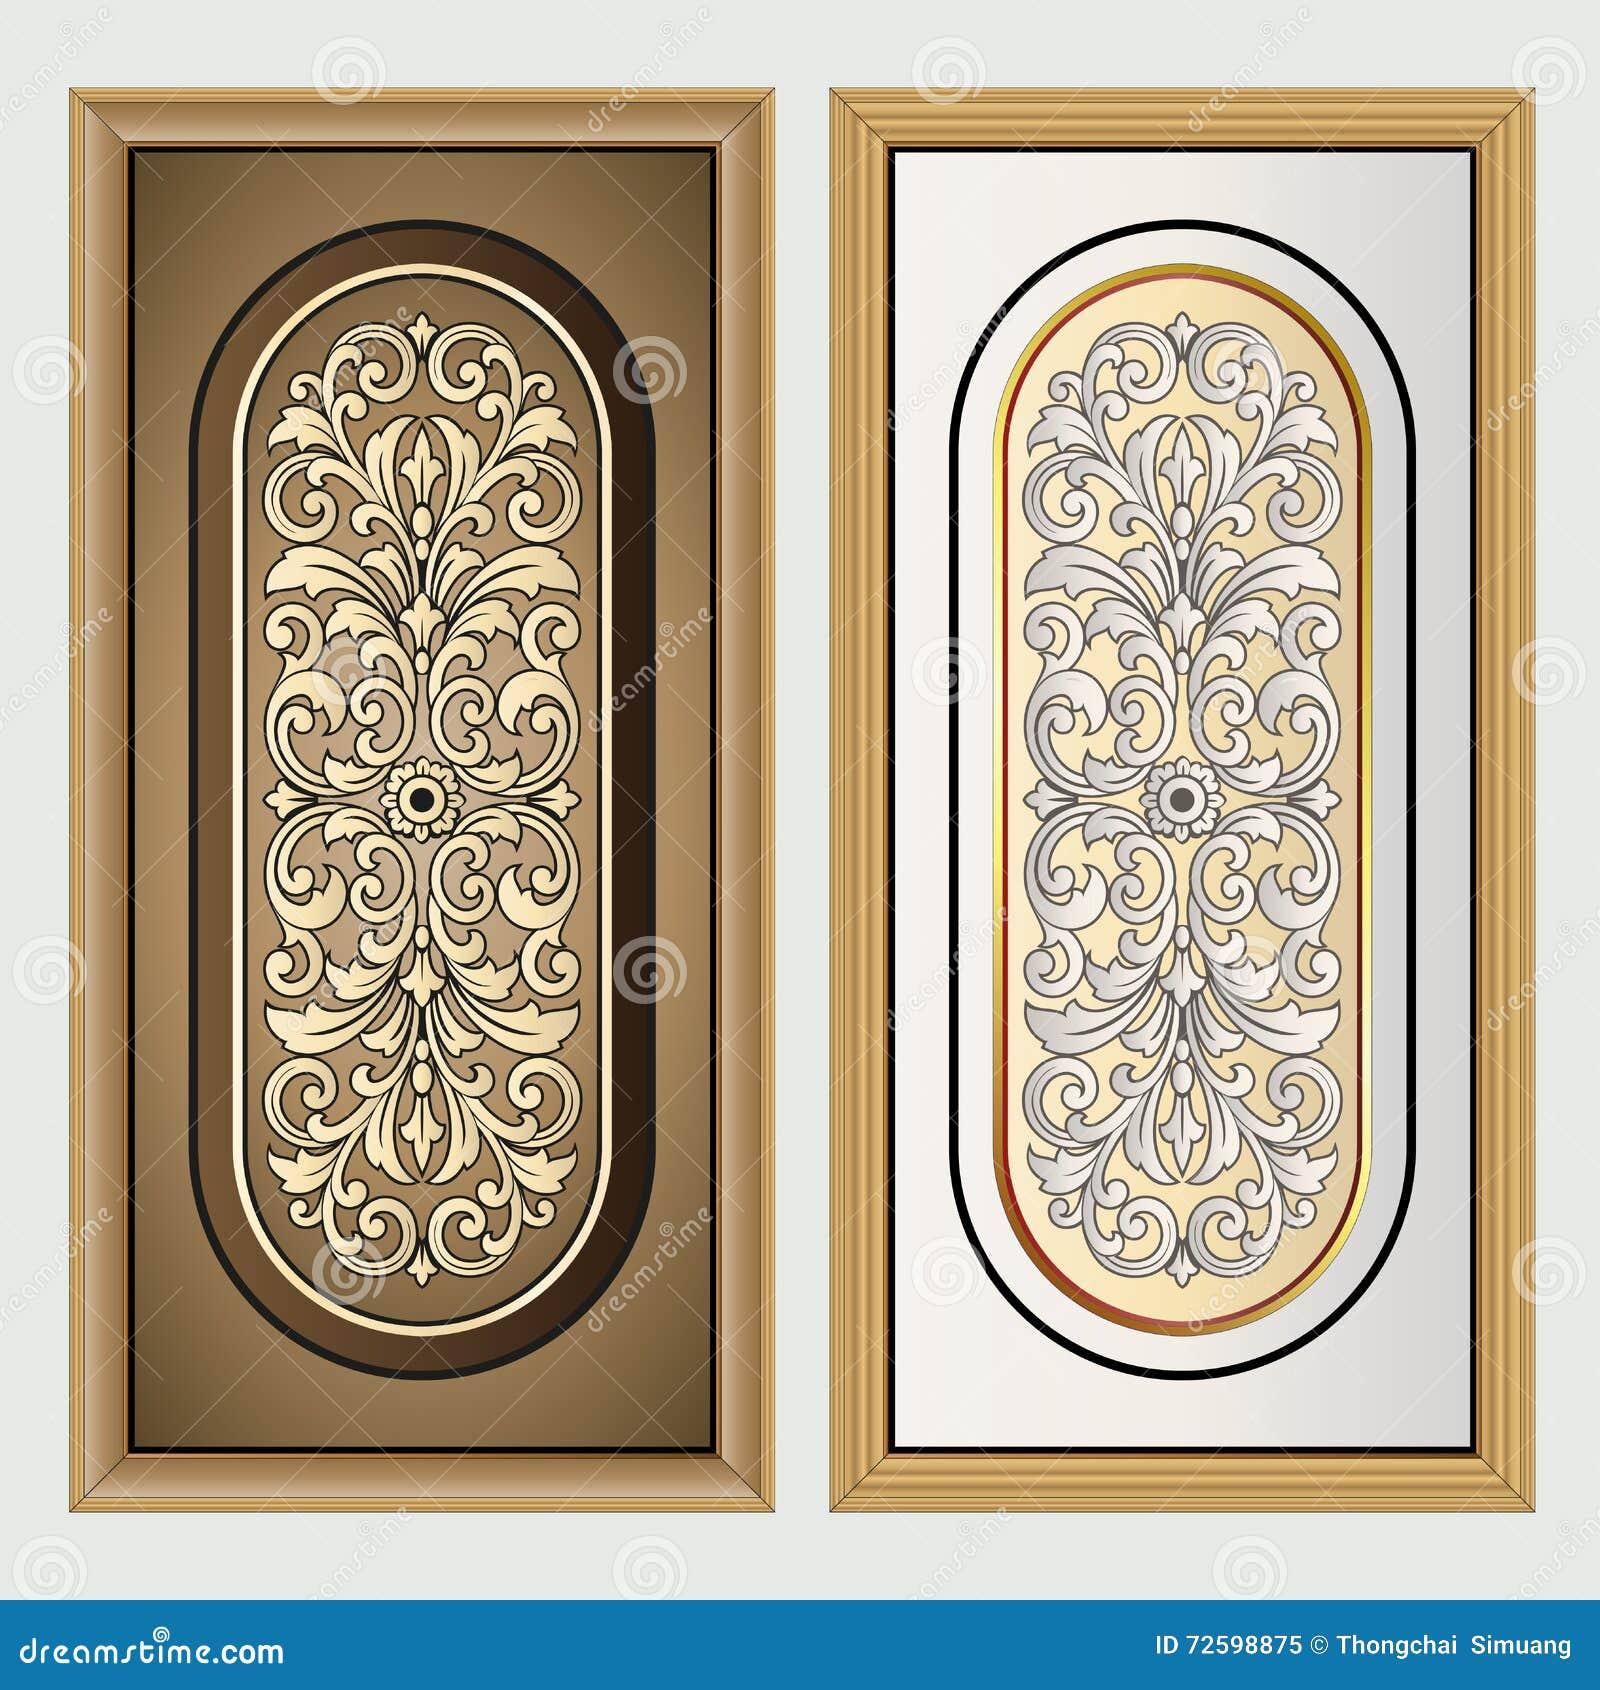 Antique label vintage frame design retro logo vector for Rococo decorative style